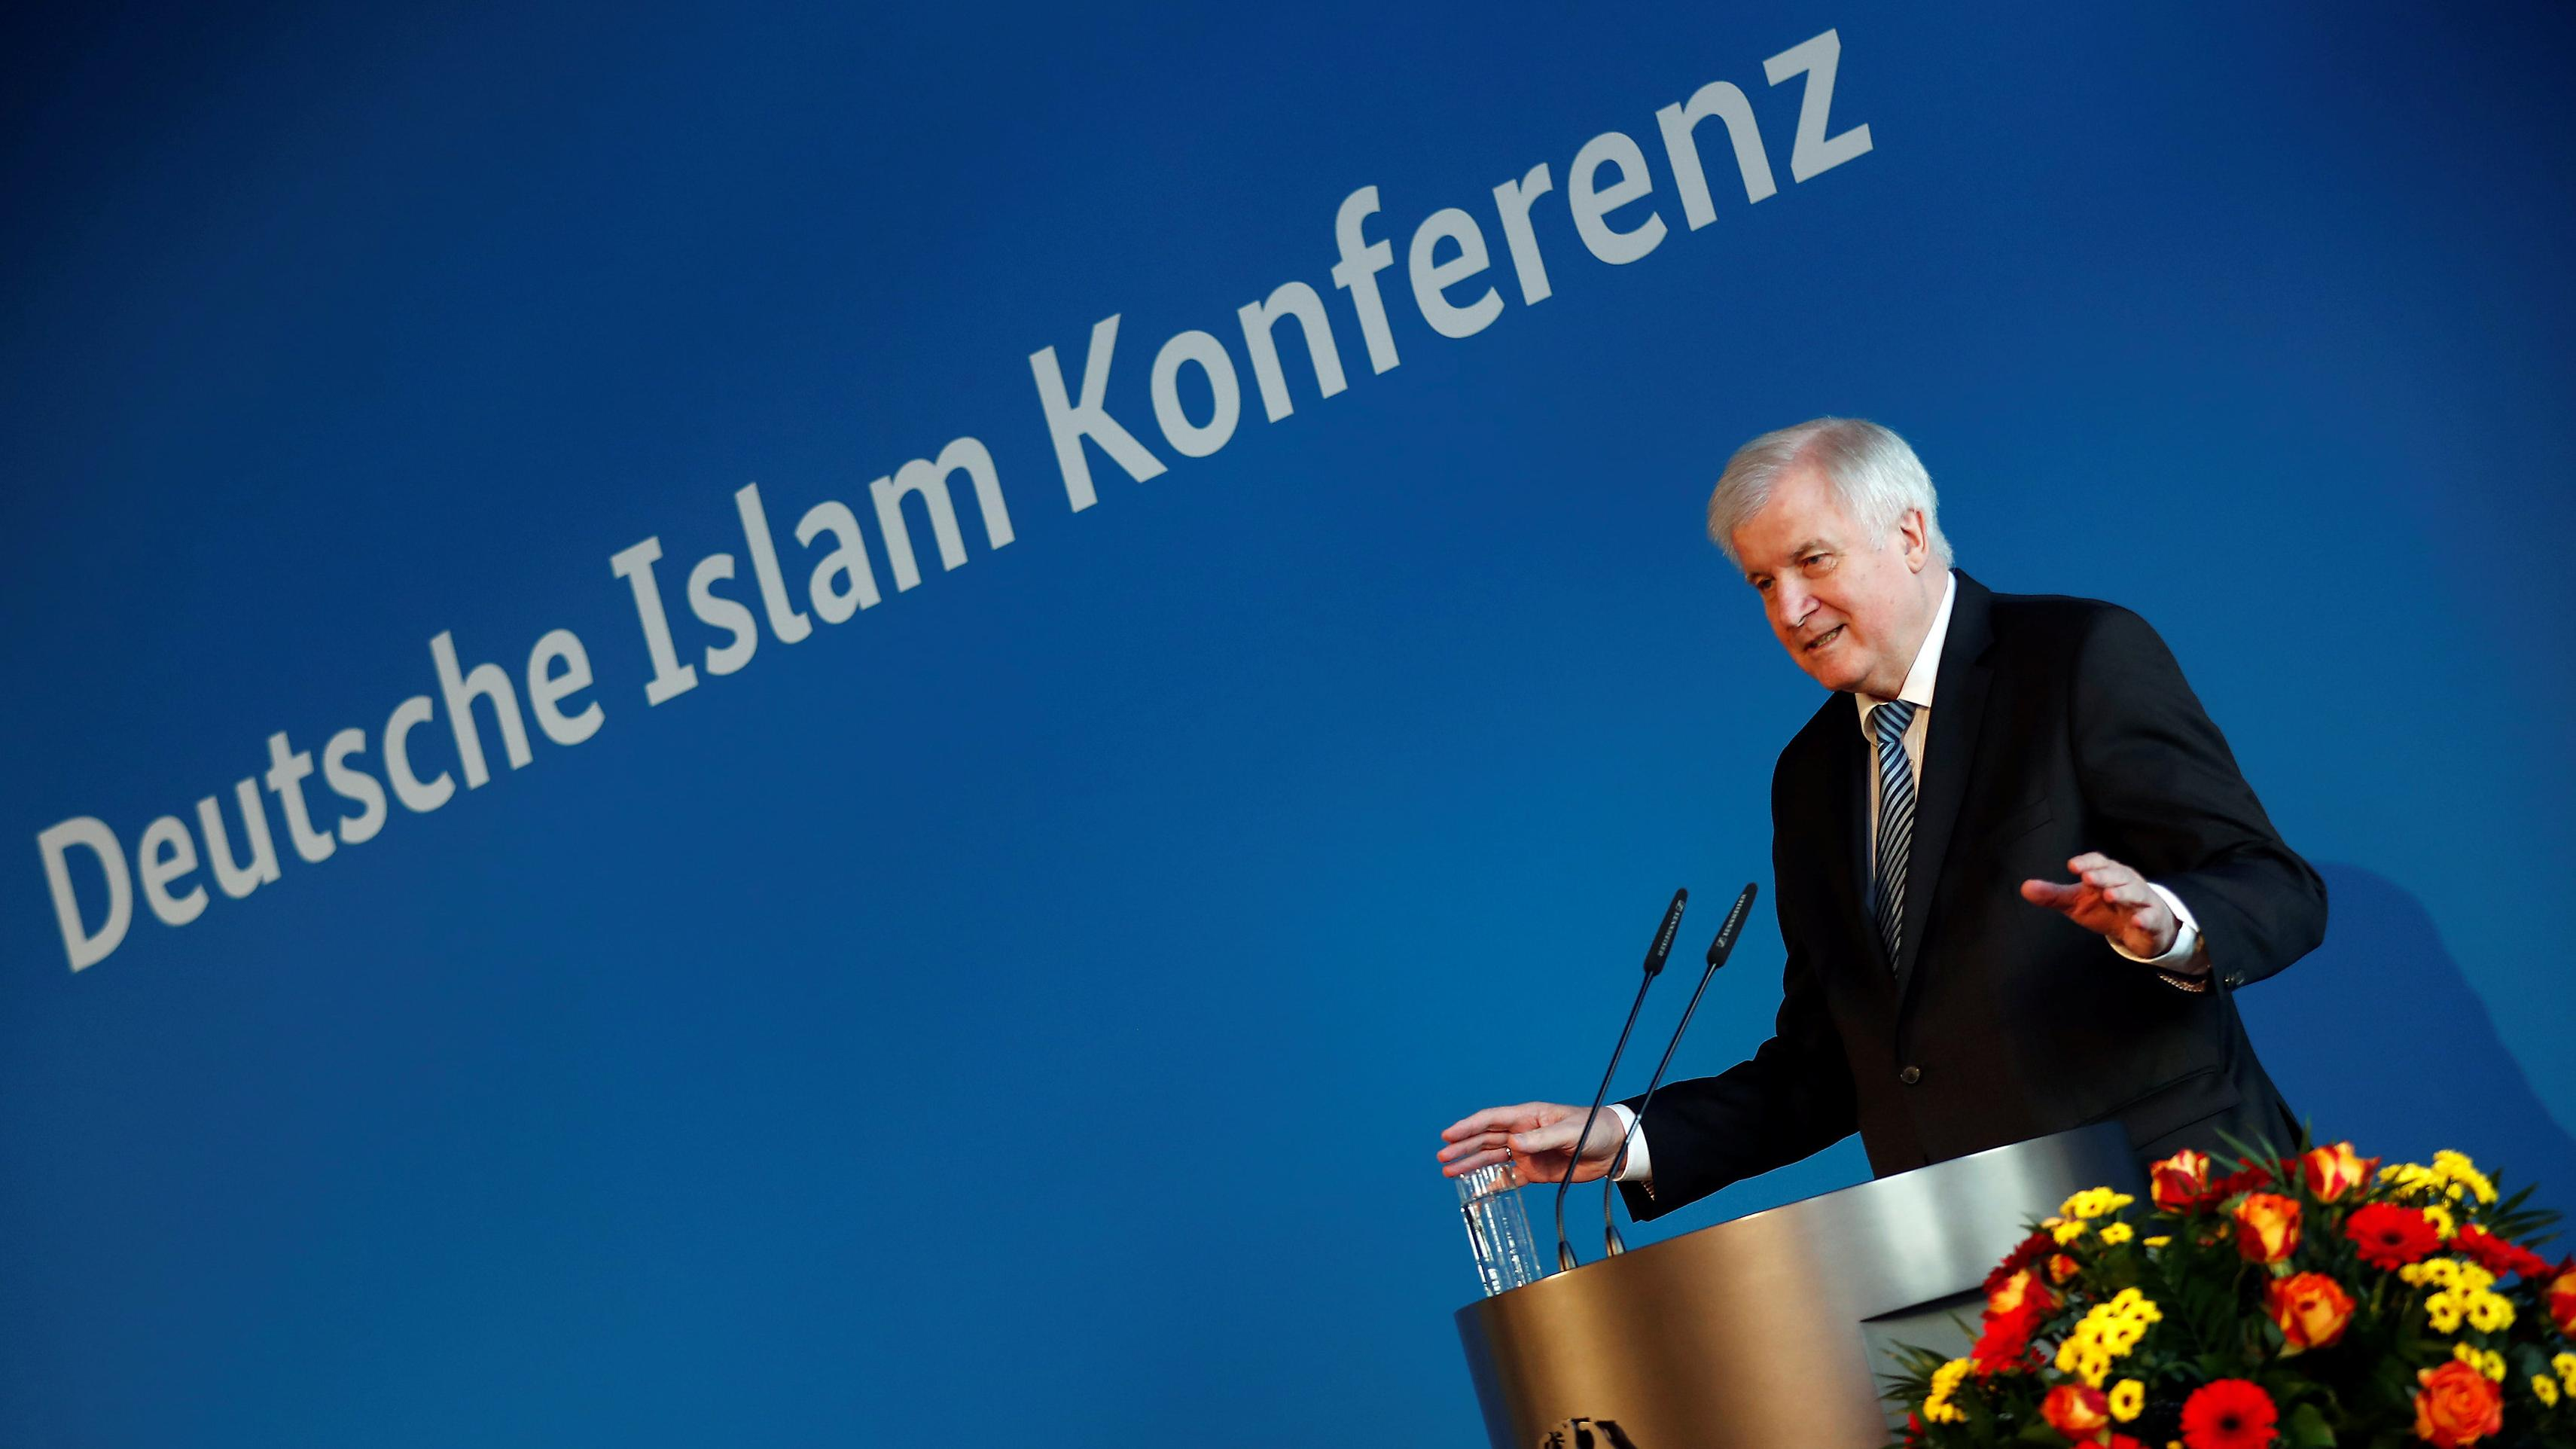 Bundesinnenminister Horst Seehofer (CSU) bei seiner Eröffnungsrede zur DIK